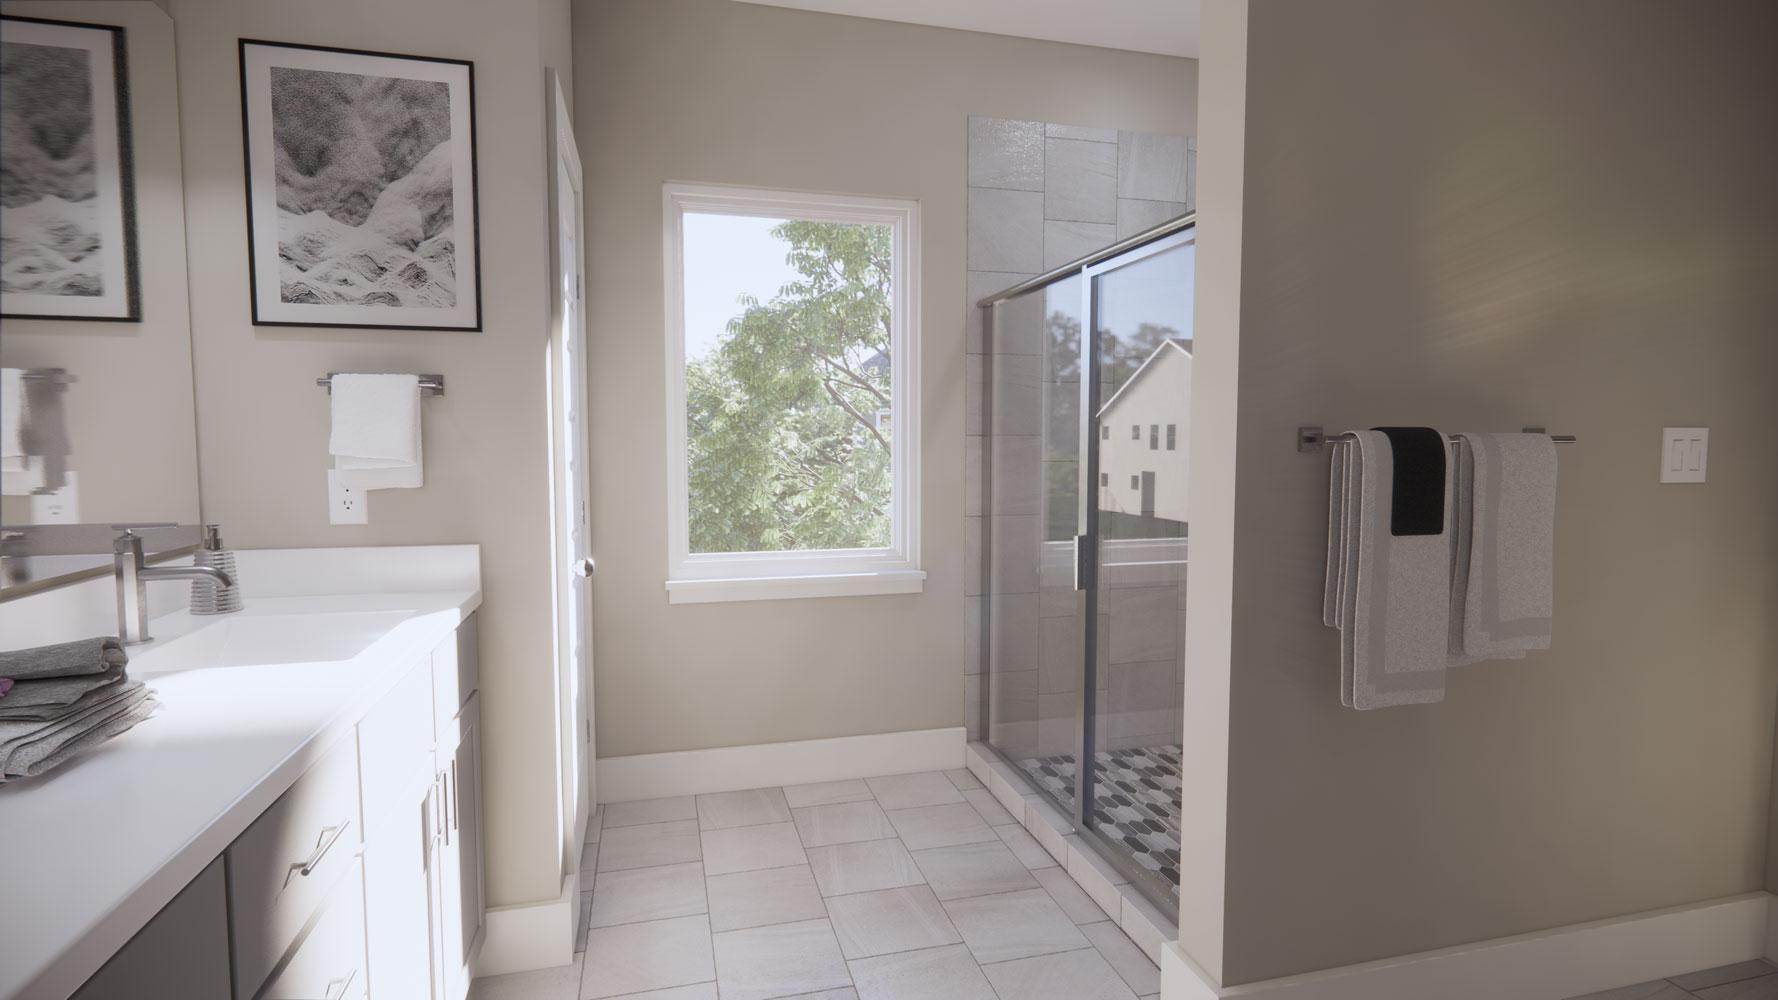 Bathroom Area at Echelon at Reverchon Bluffs in Dallas, Texas